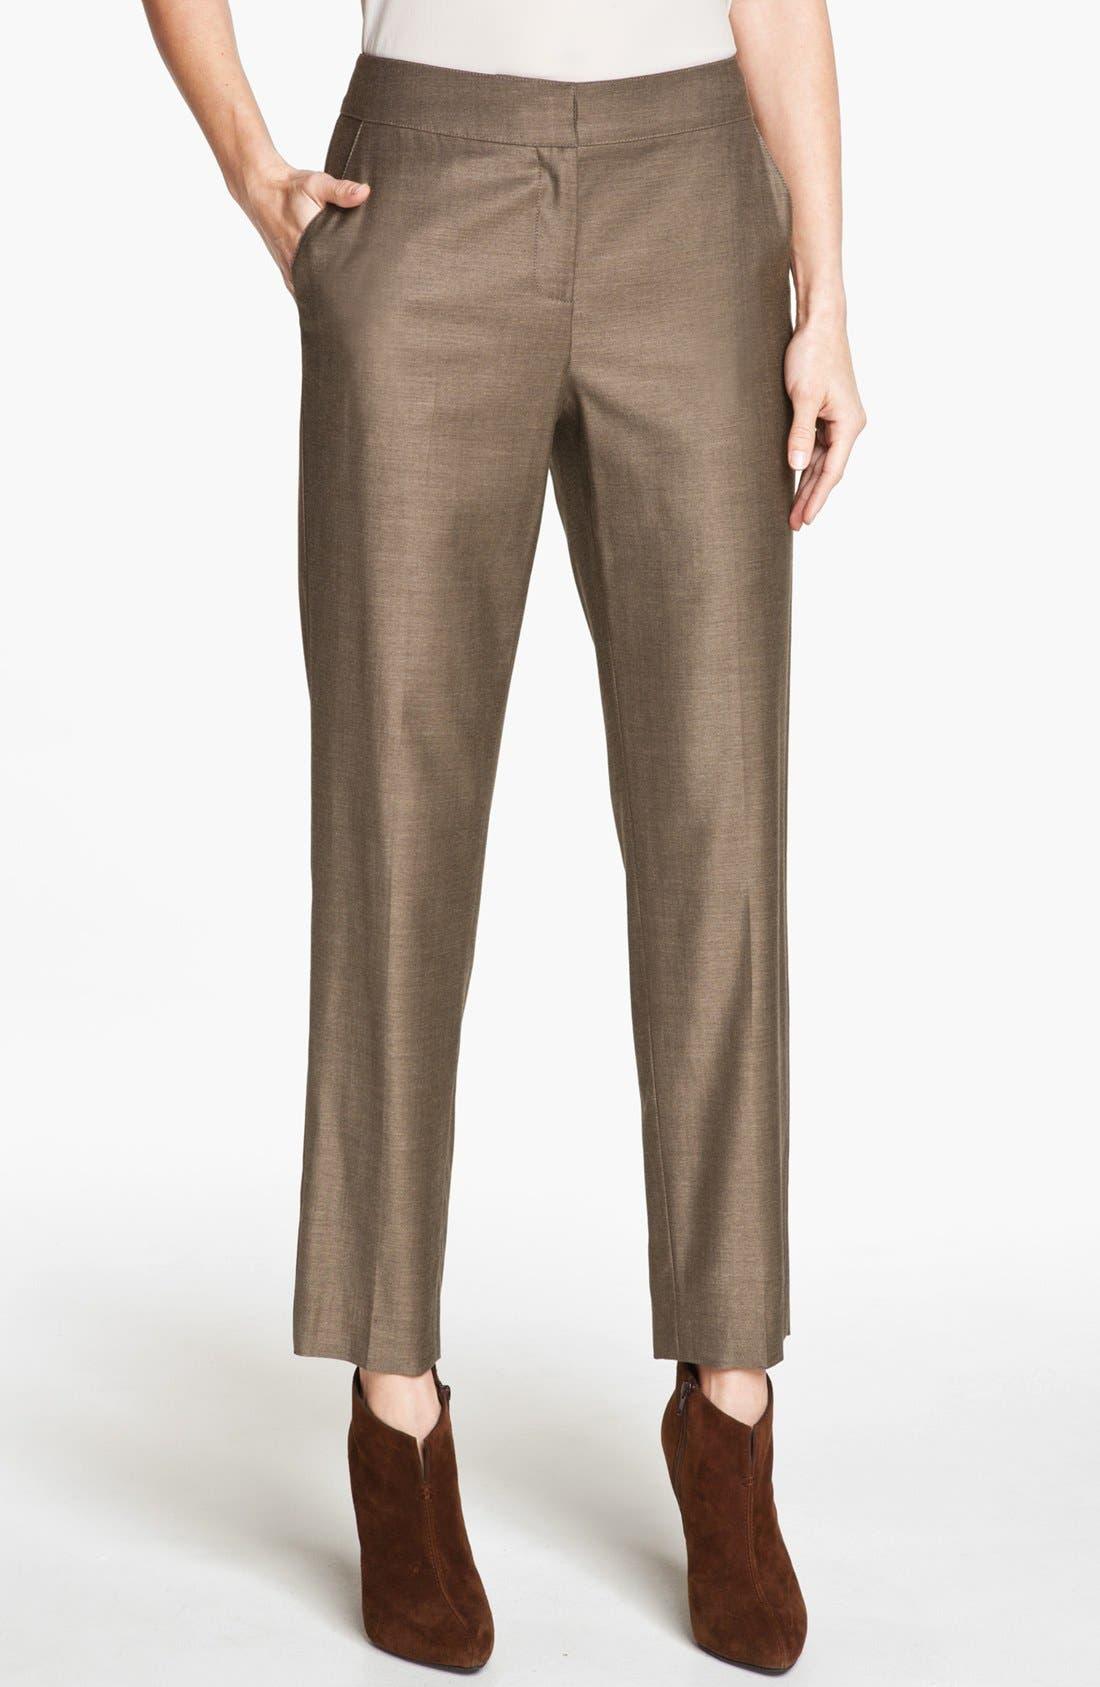 Main Image - St. John Collection 'Emma' Shimmer Twill Crop Pants